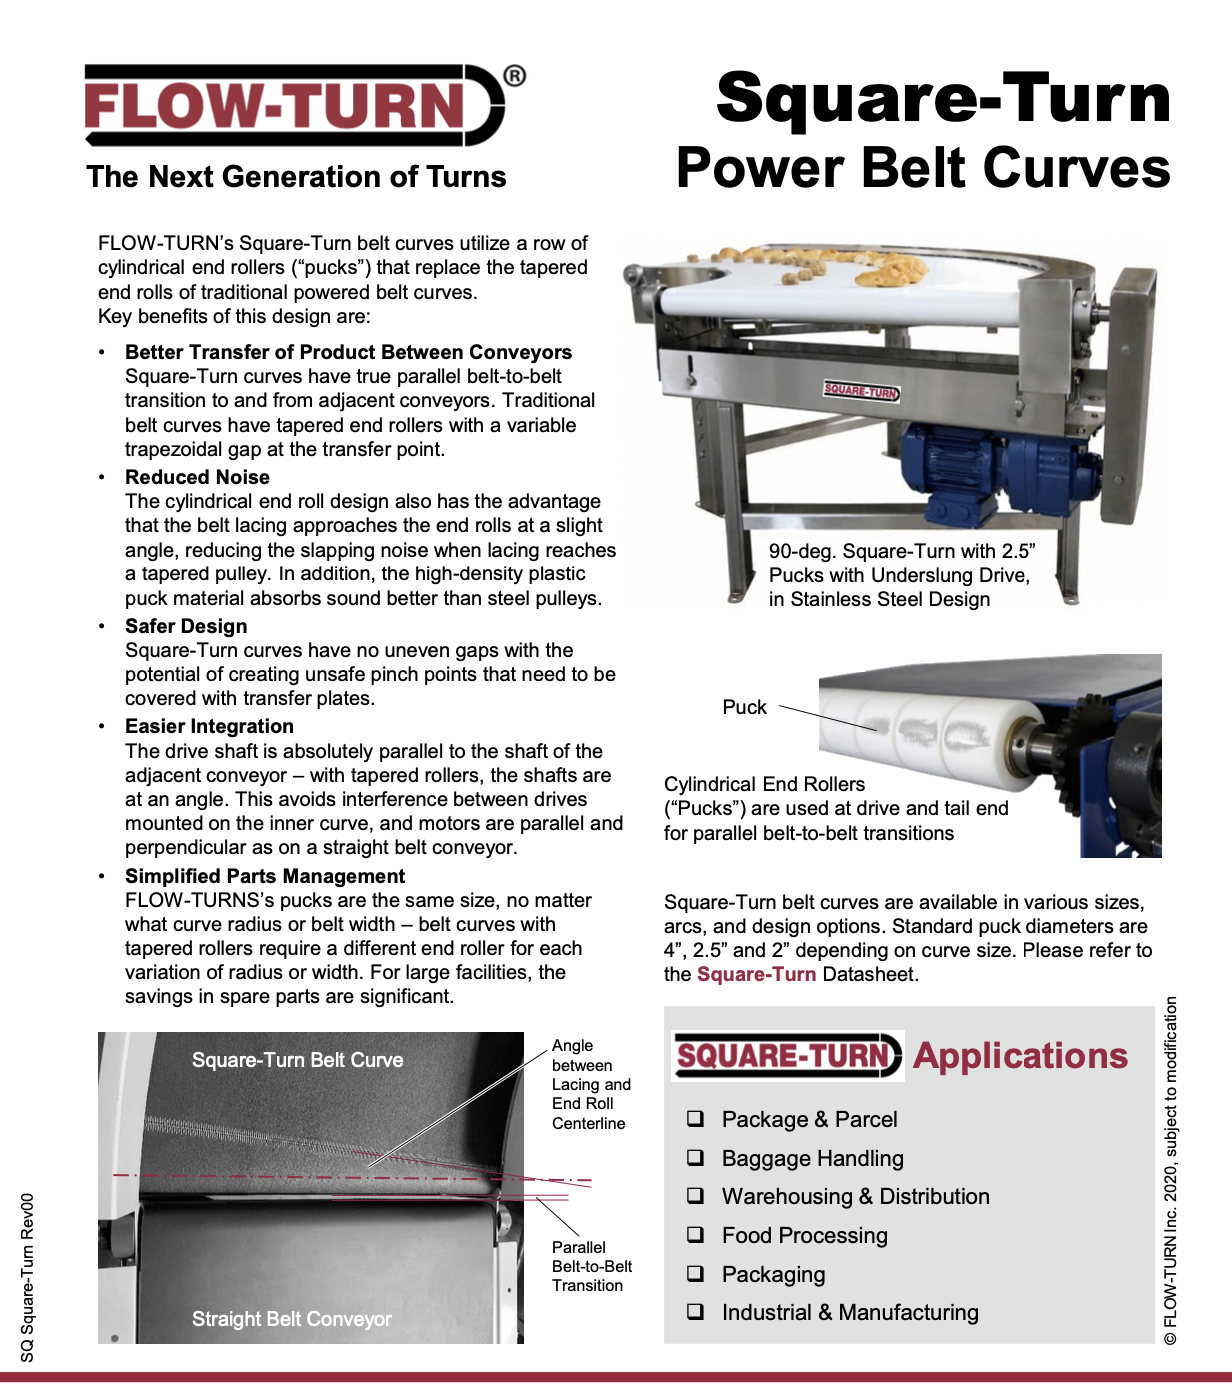 Square-Turn